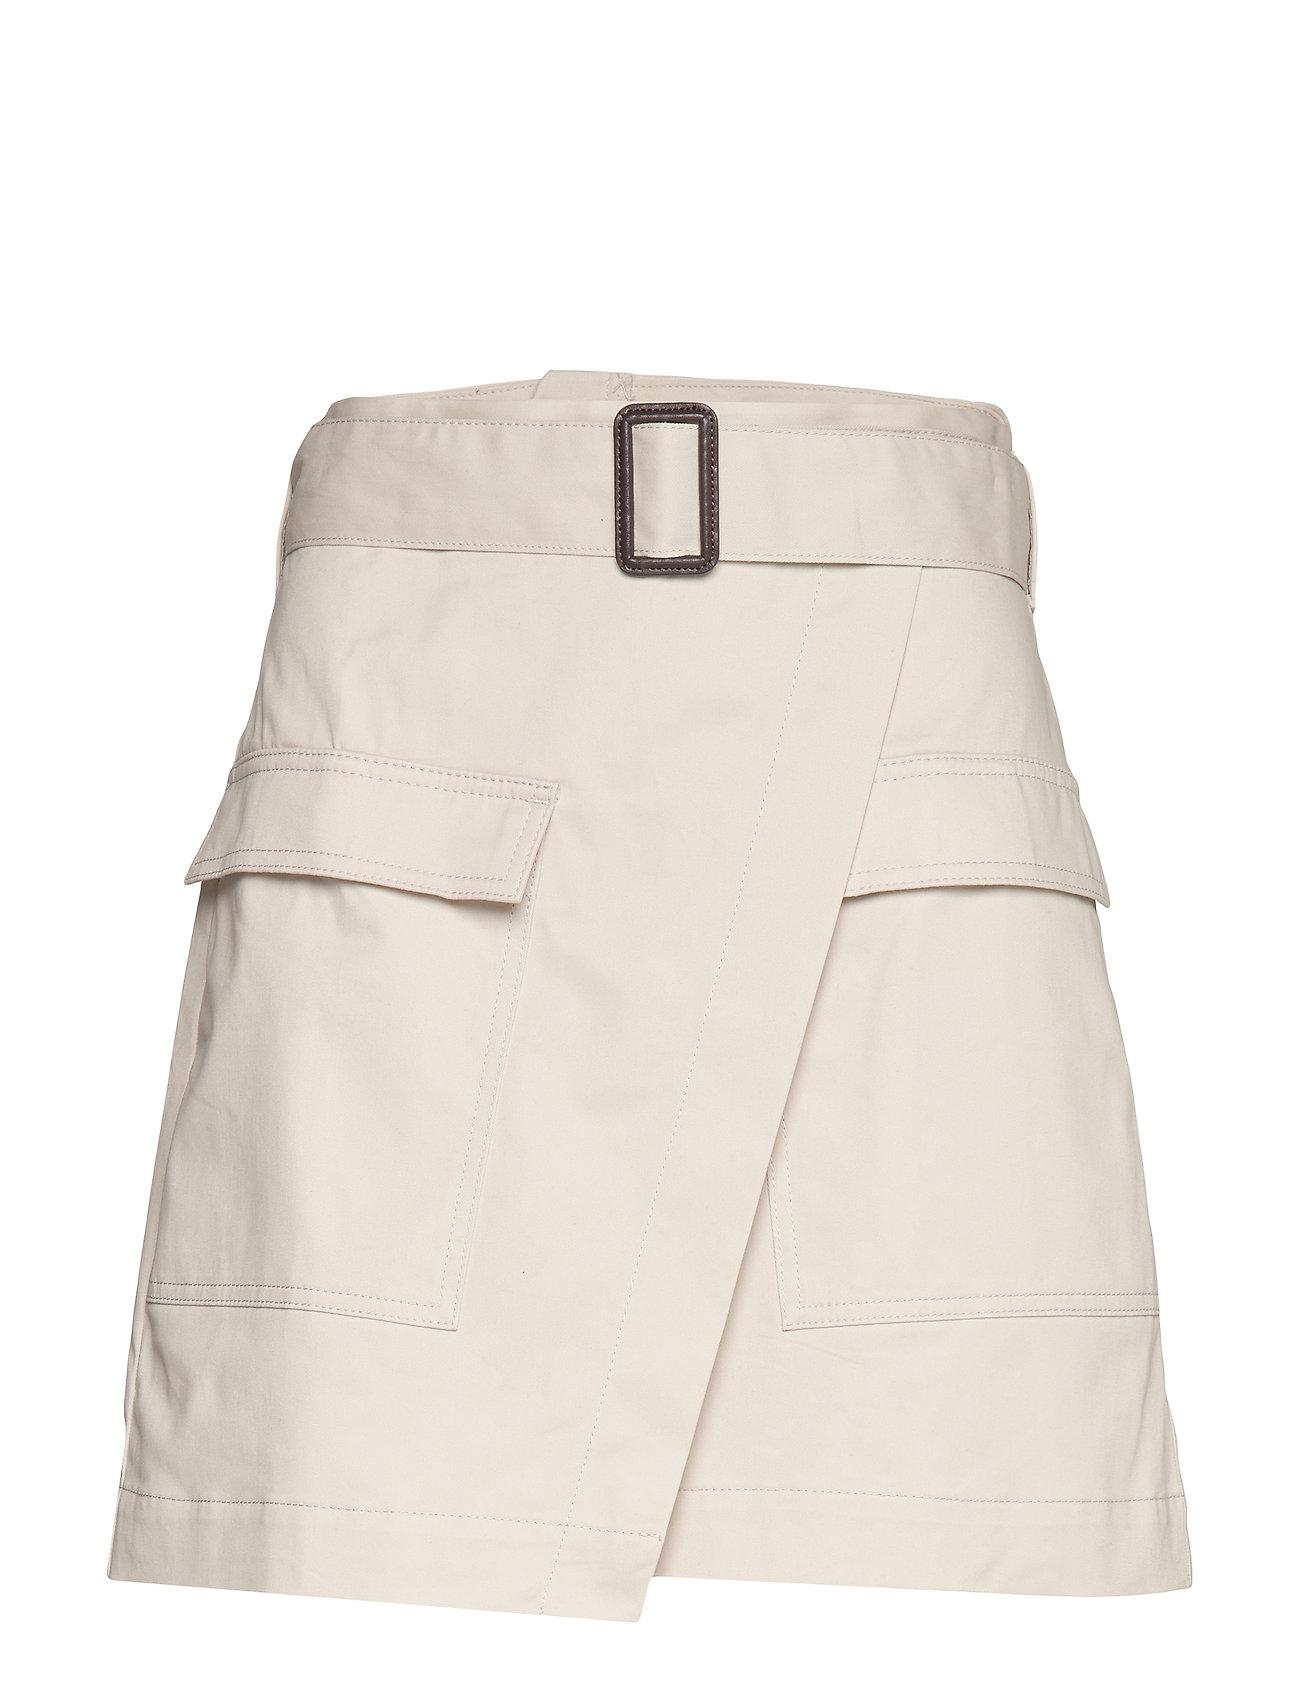 Banana Republic Utility Wrap Skirt - STONE